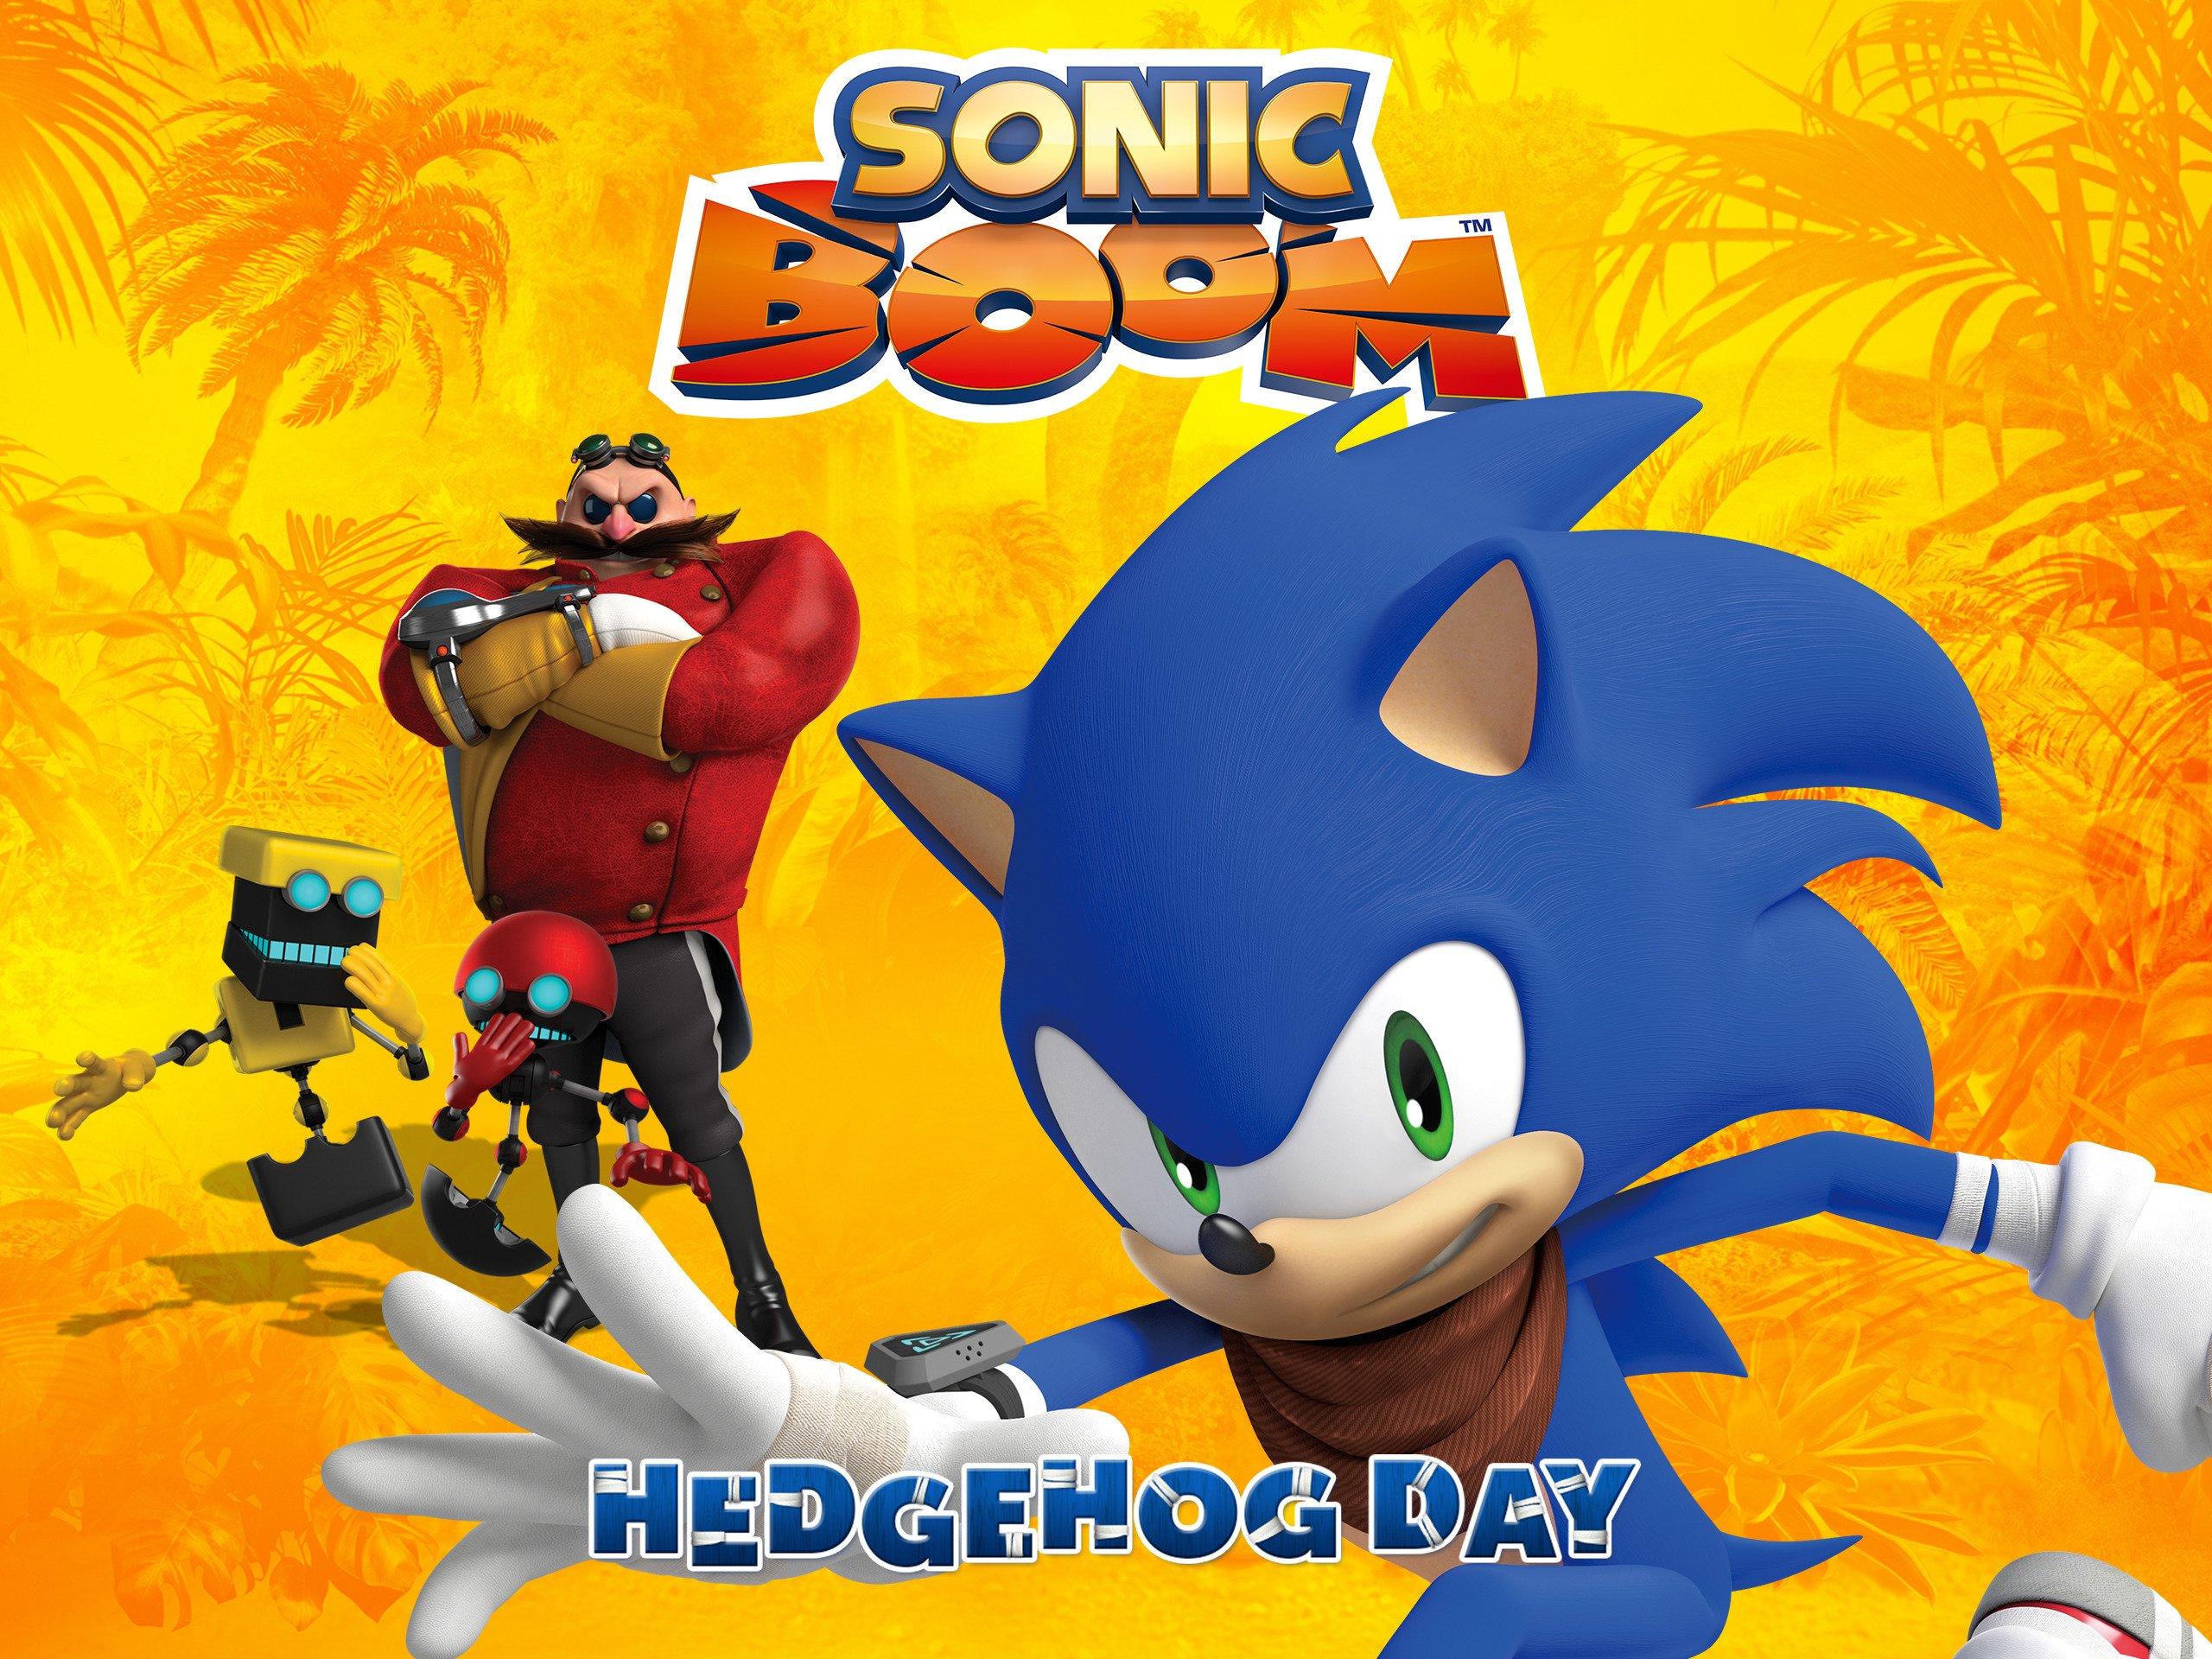 Watch Sonic Boom Vol 2 Hedgehog Day Prime Video